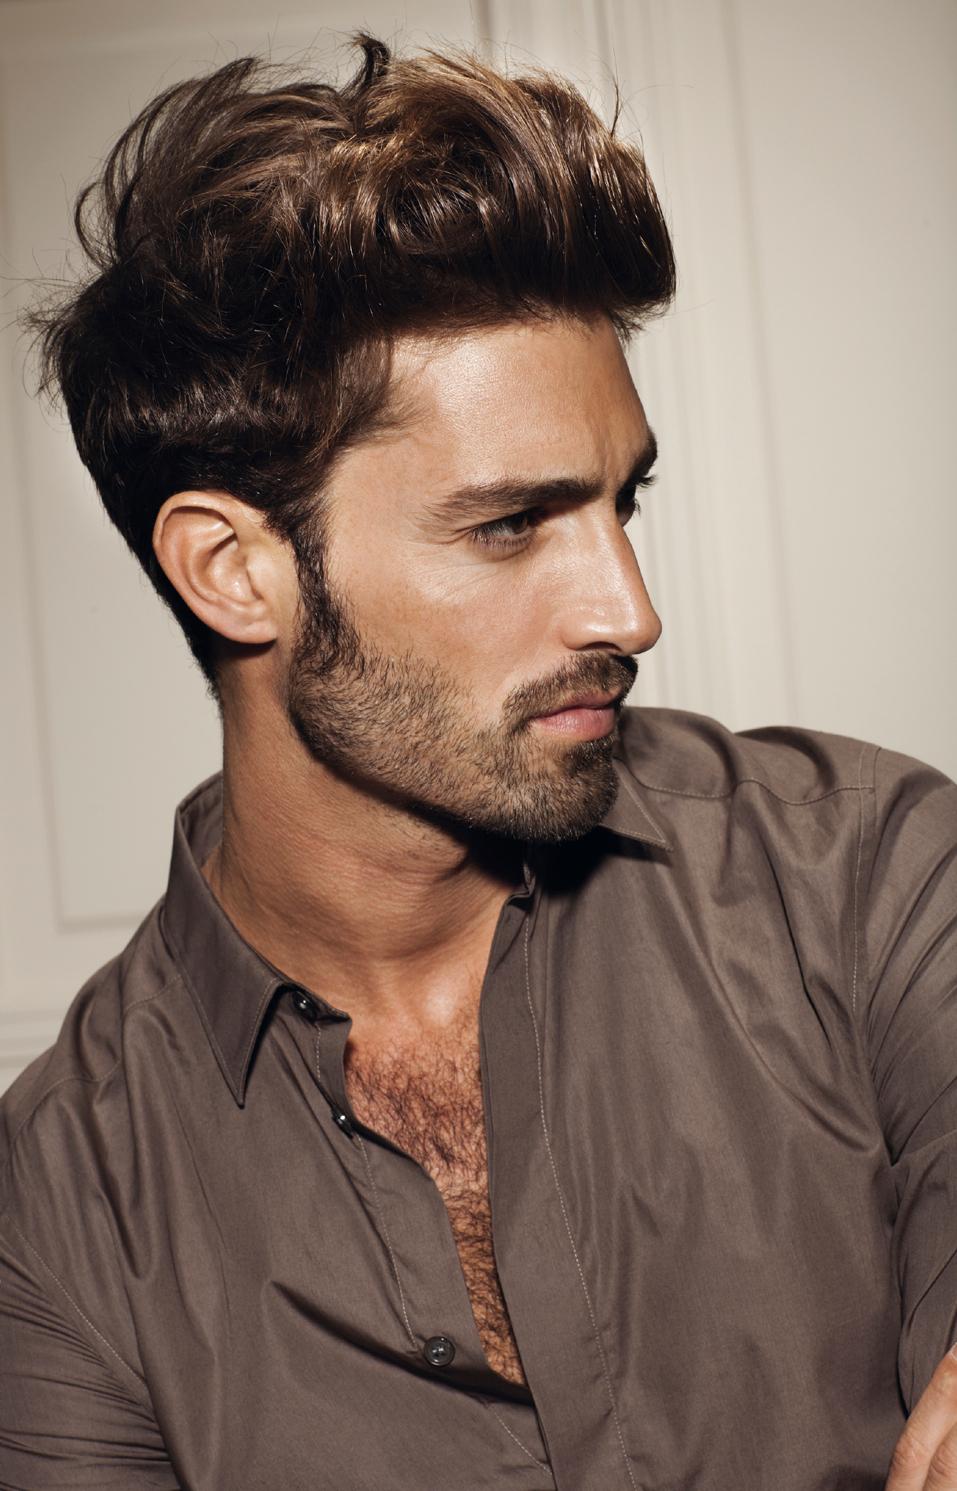 Cesar acu a beauty culture cabellos hombres oto o invierno - Meche caramel homme ...